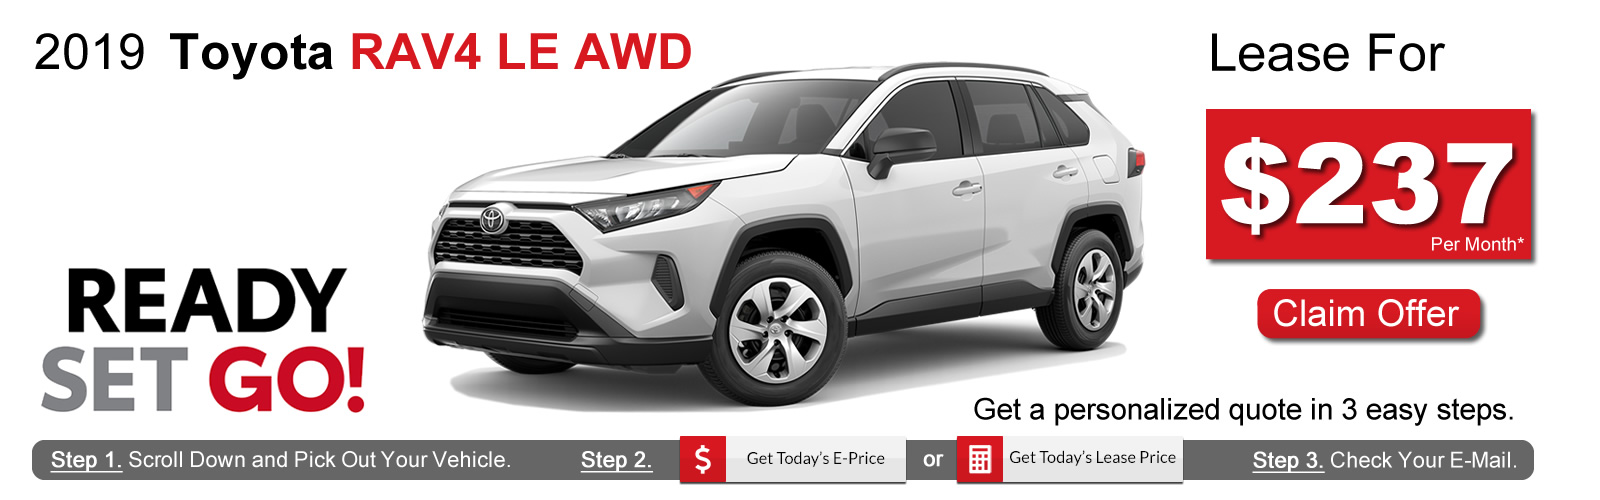 2019 Toyota RAV4 Lease Deals near Boston, MA